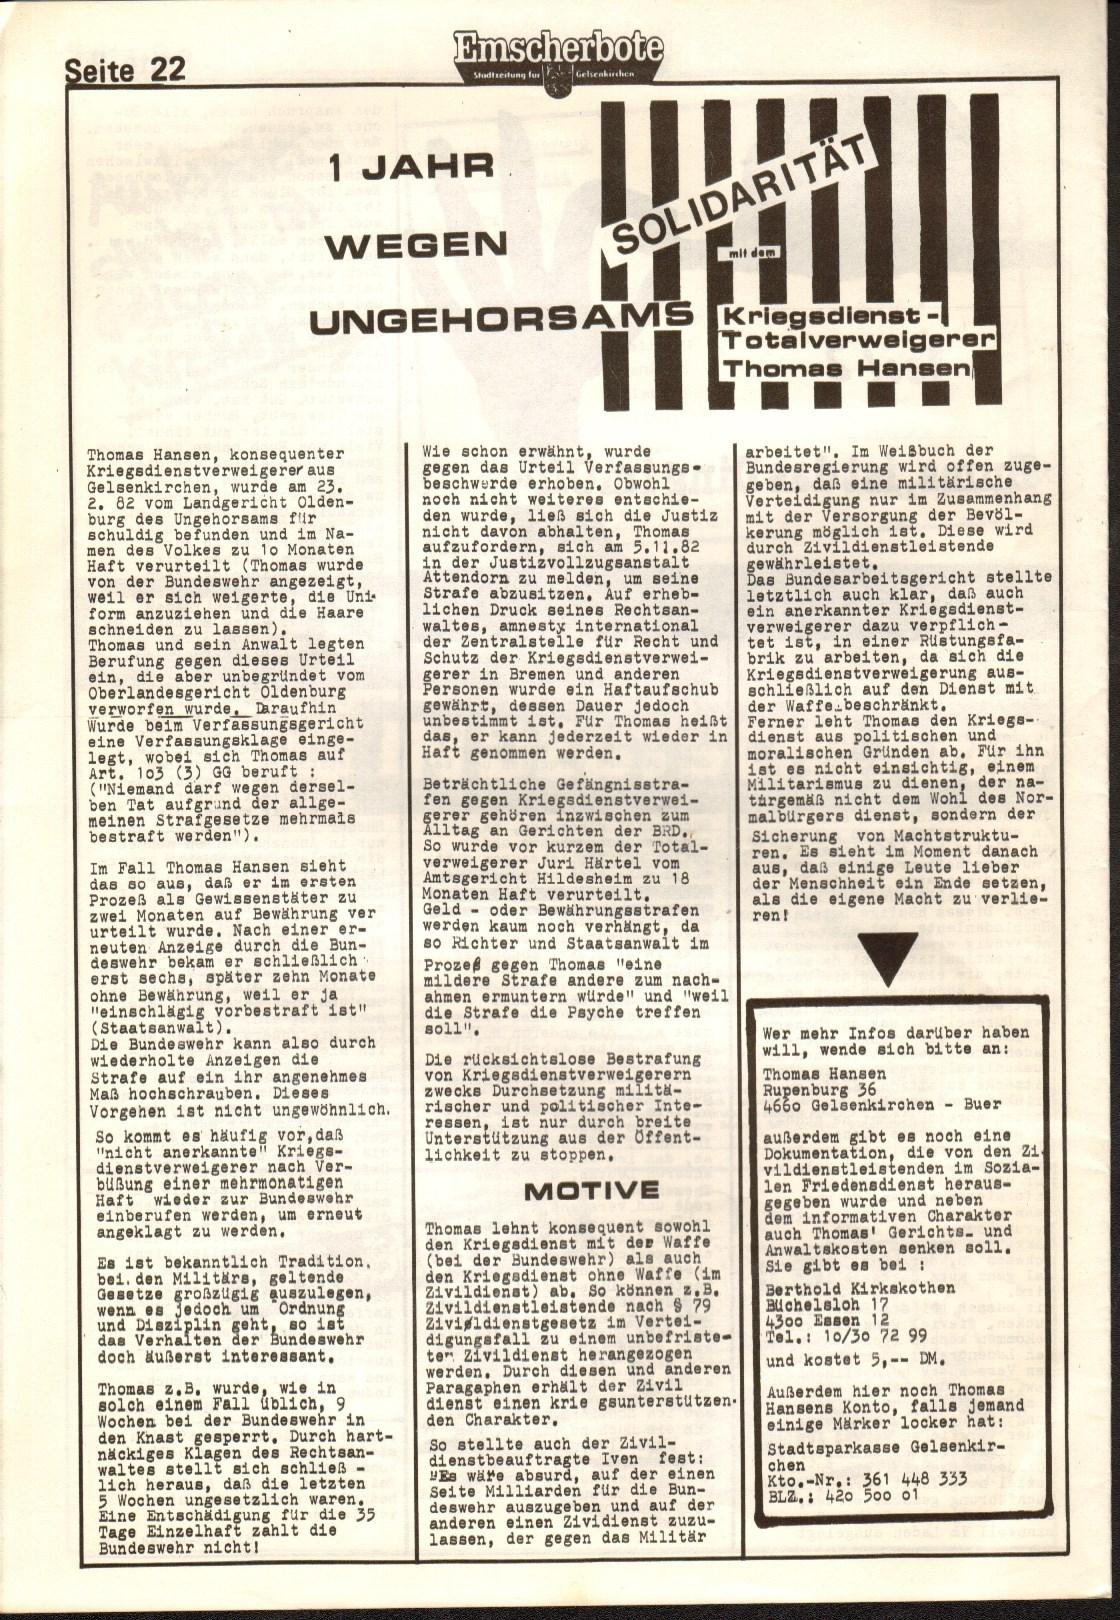 Gelsenkirchen_Emscherbote_1982_23_22